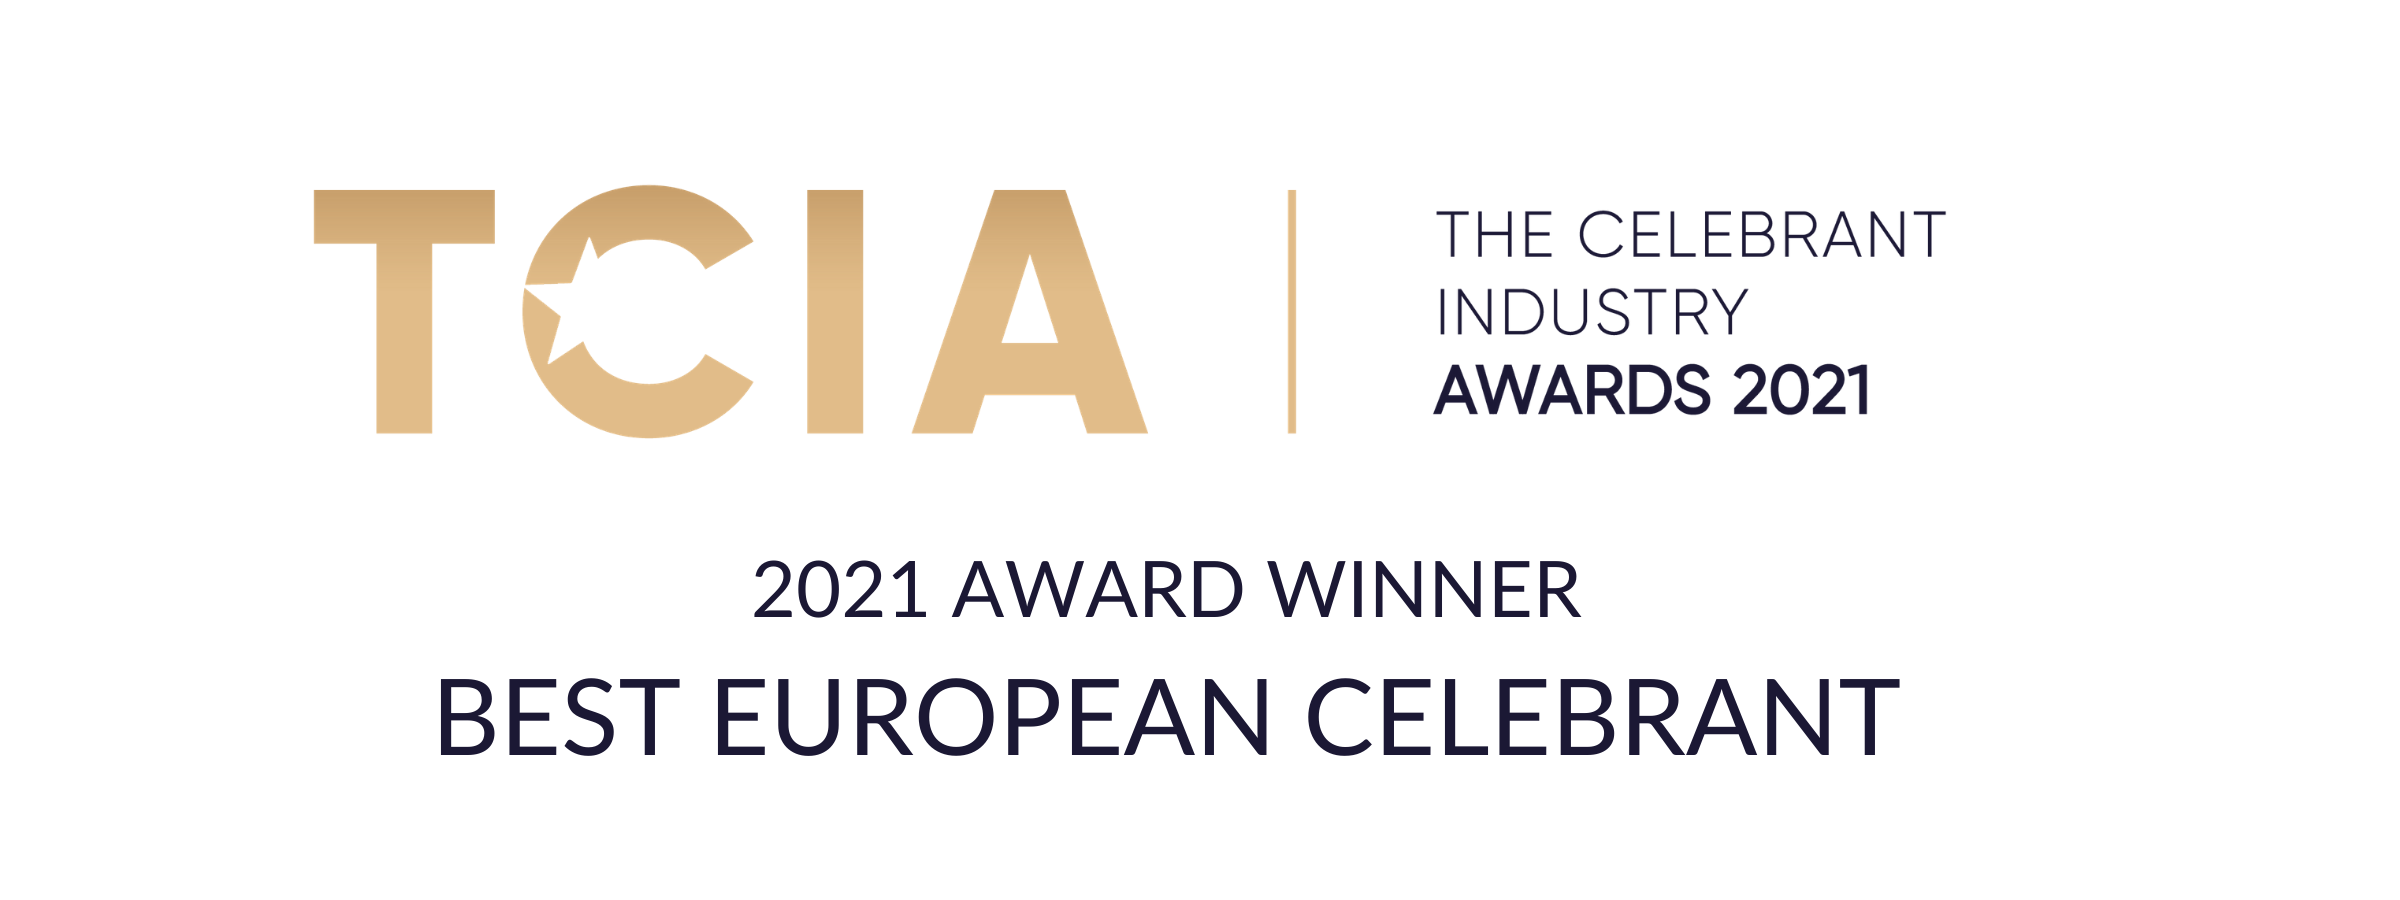 2021 Best European Celebrant Award